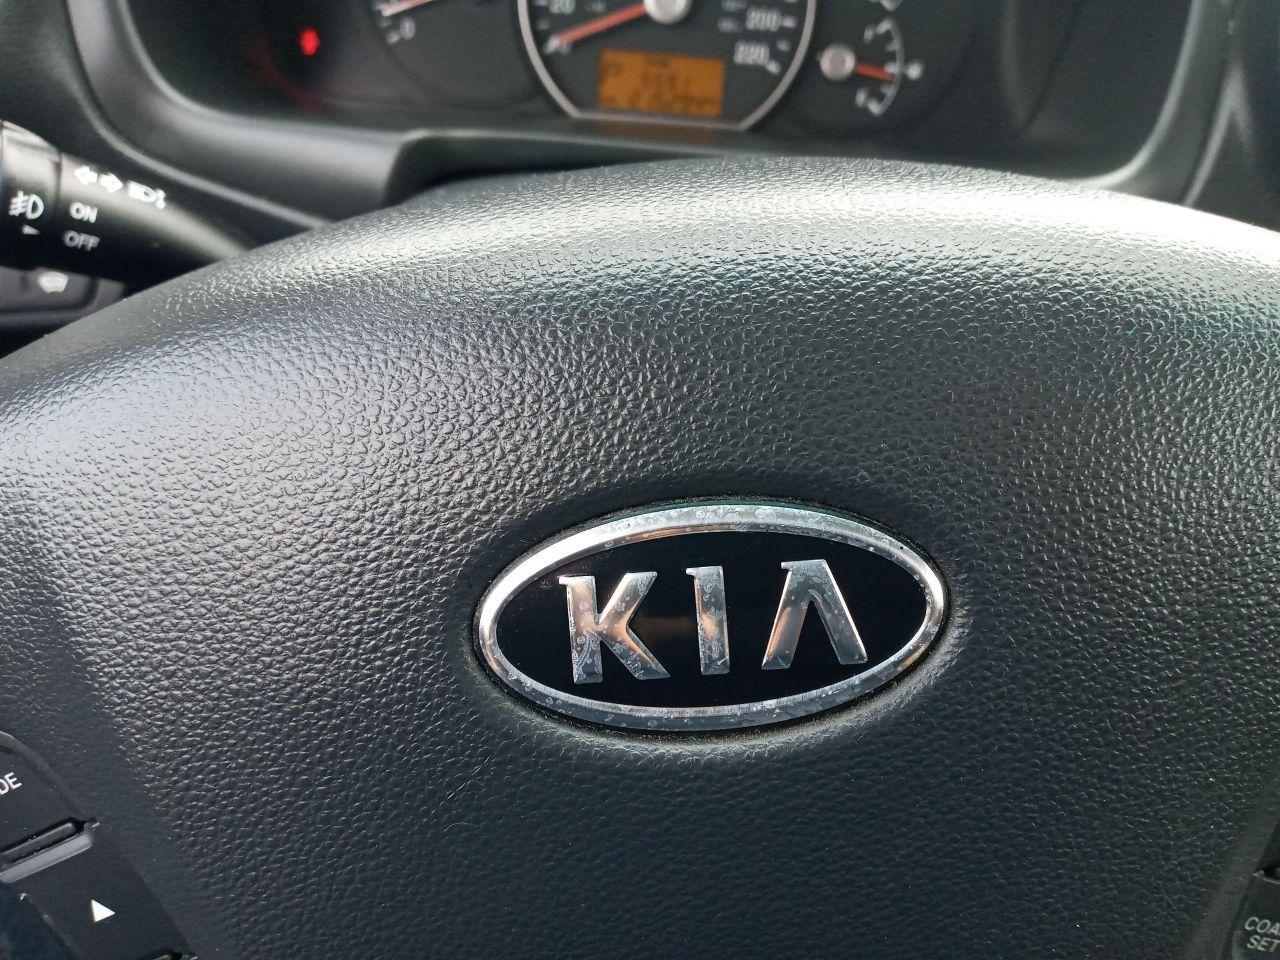 2012 Kia Rondo